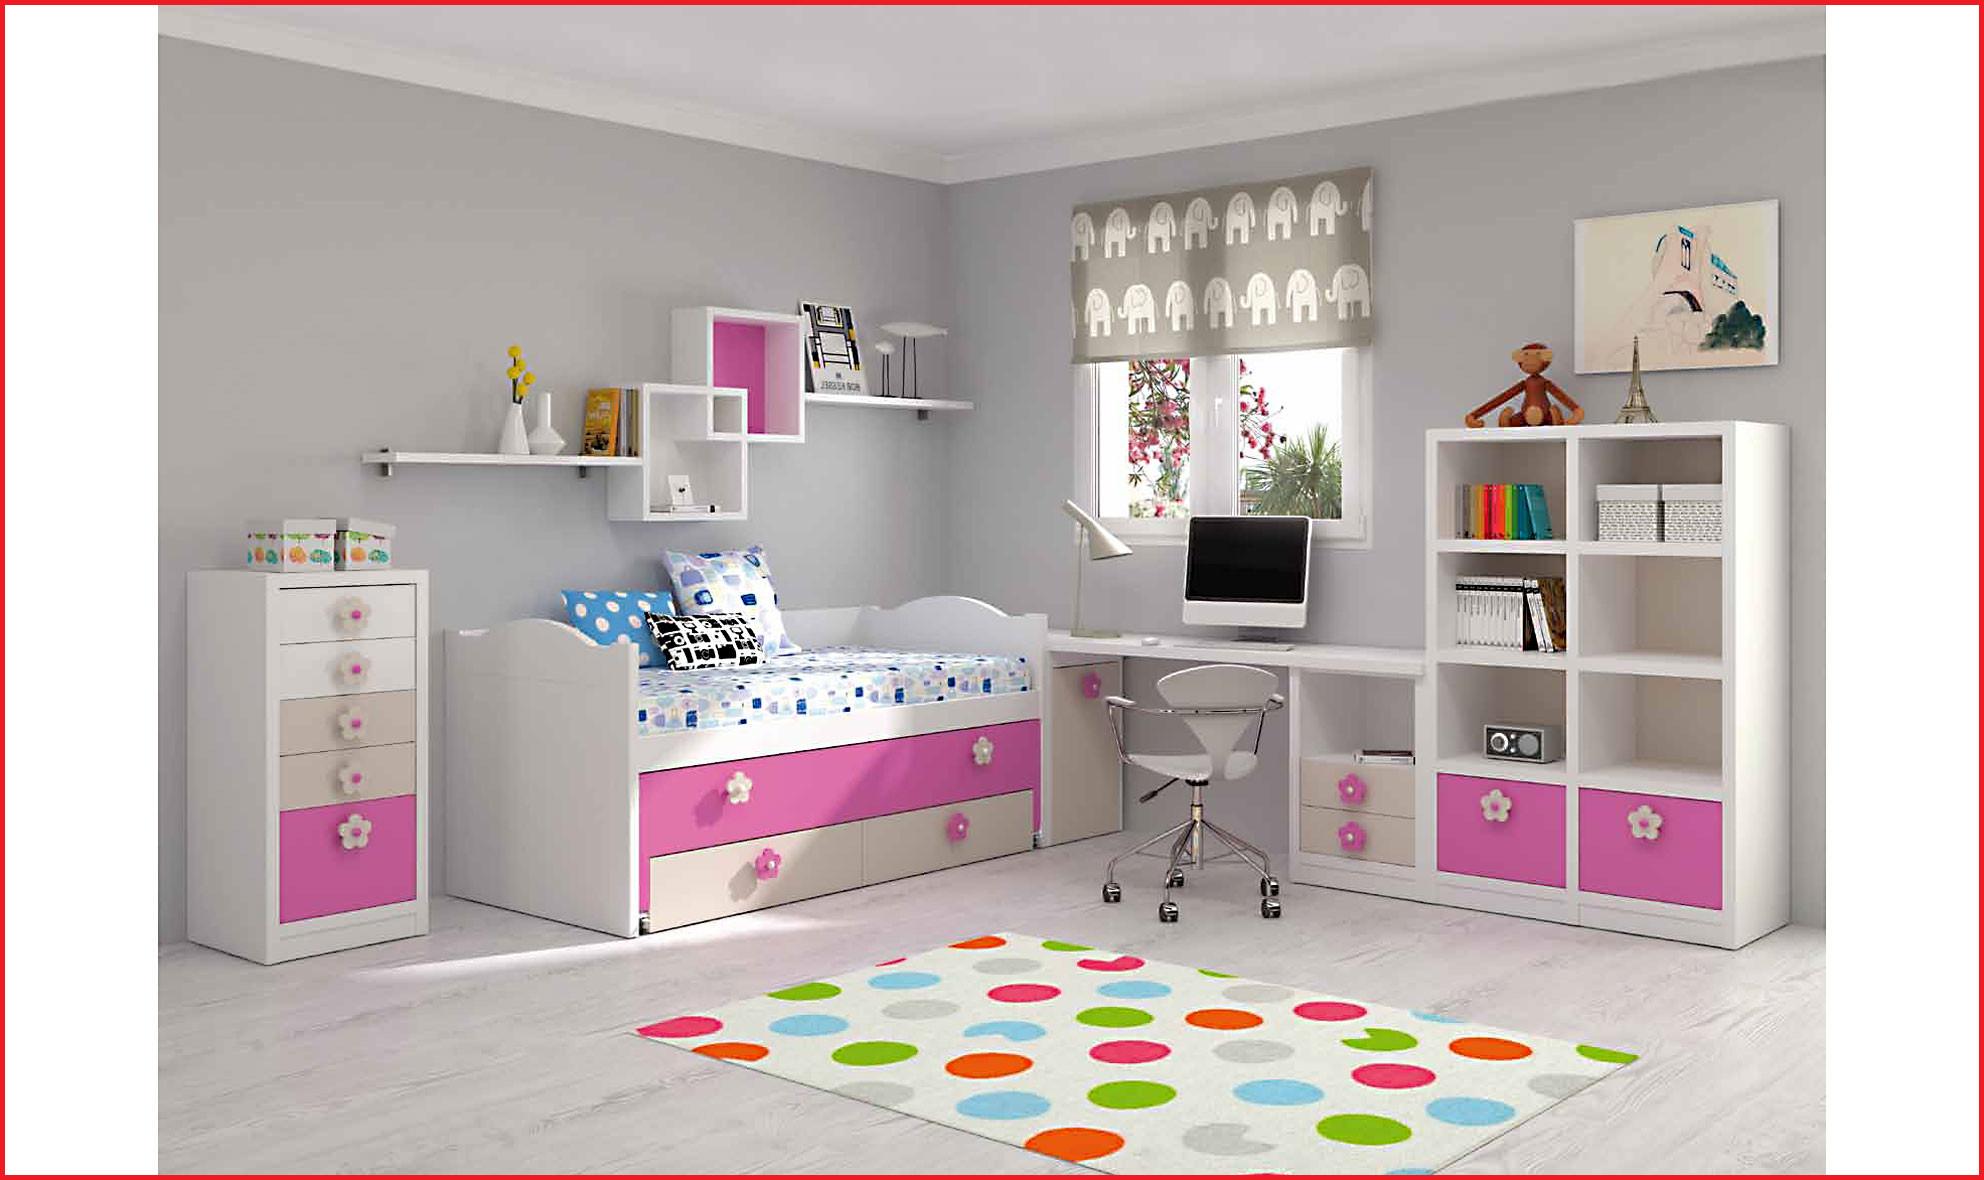 Muebles De Habitacion Whdr Muebles De Dormitorio De Nià Os Muebles De Nià Os Baratos